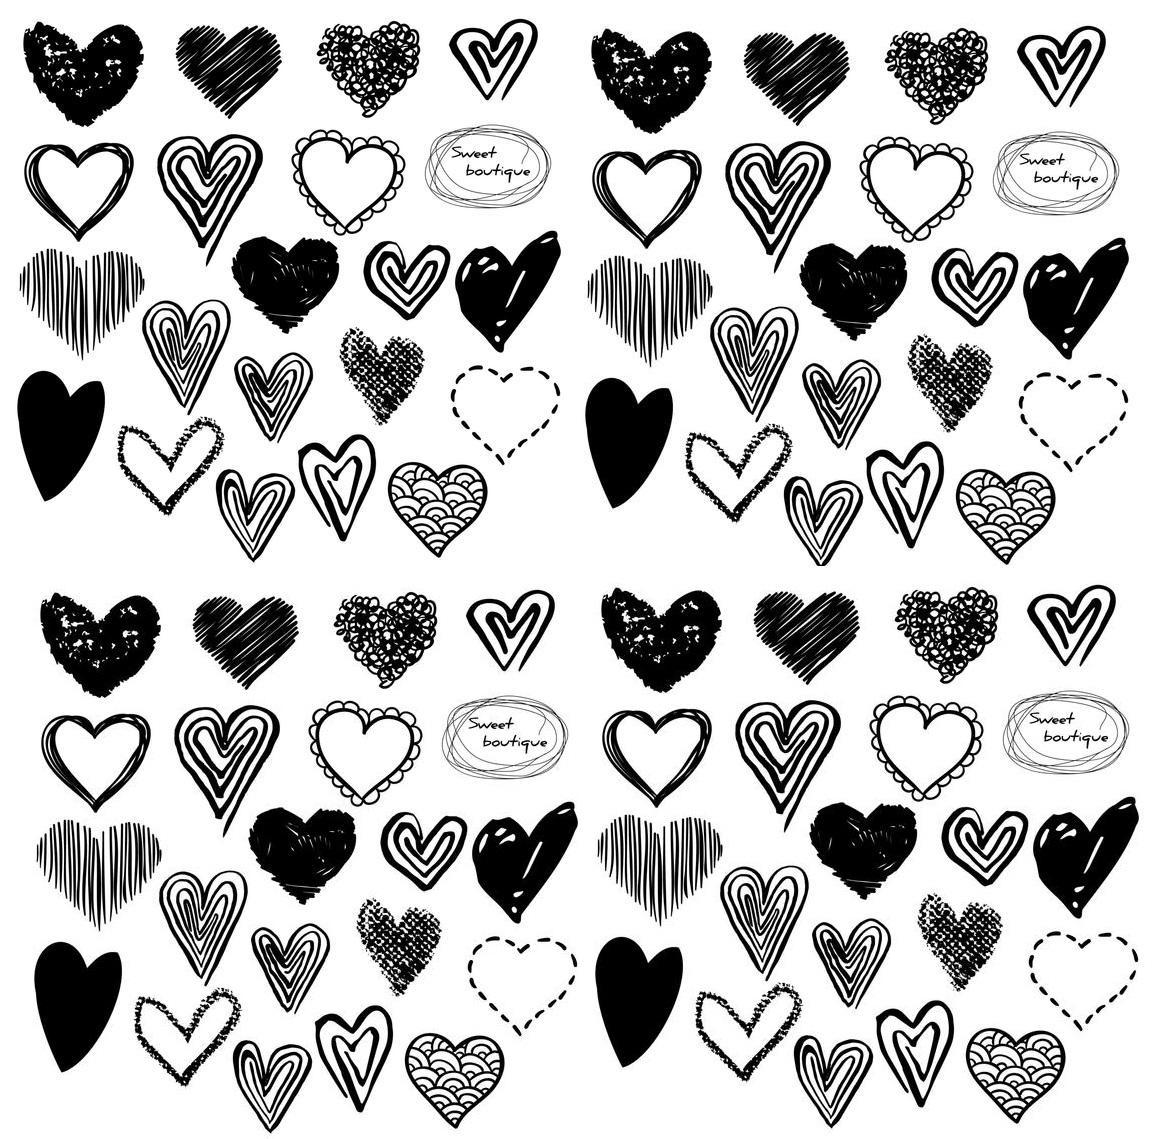 Small Hearts Cliparts Black And White.